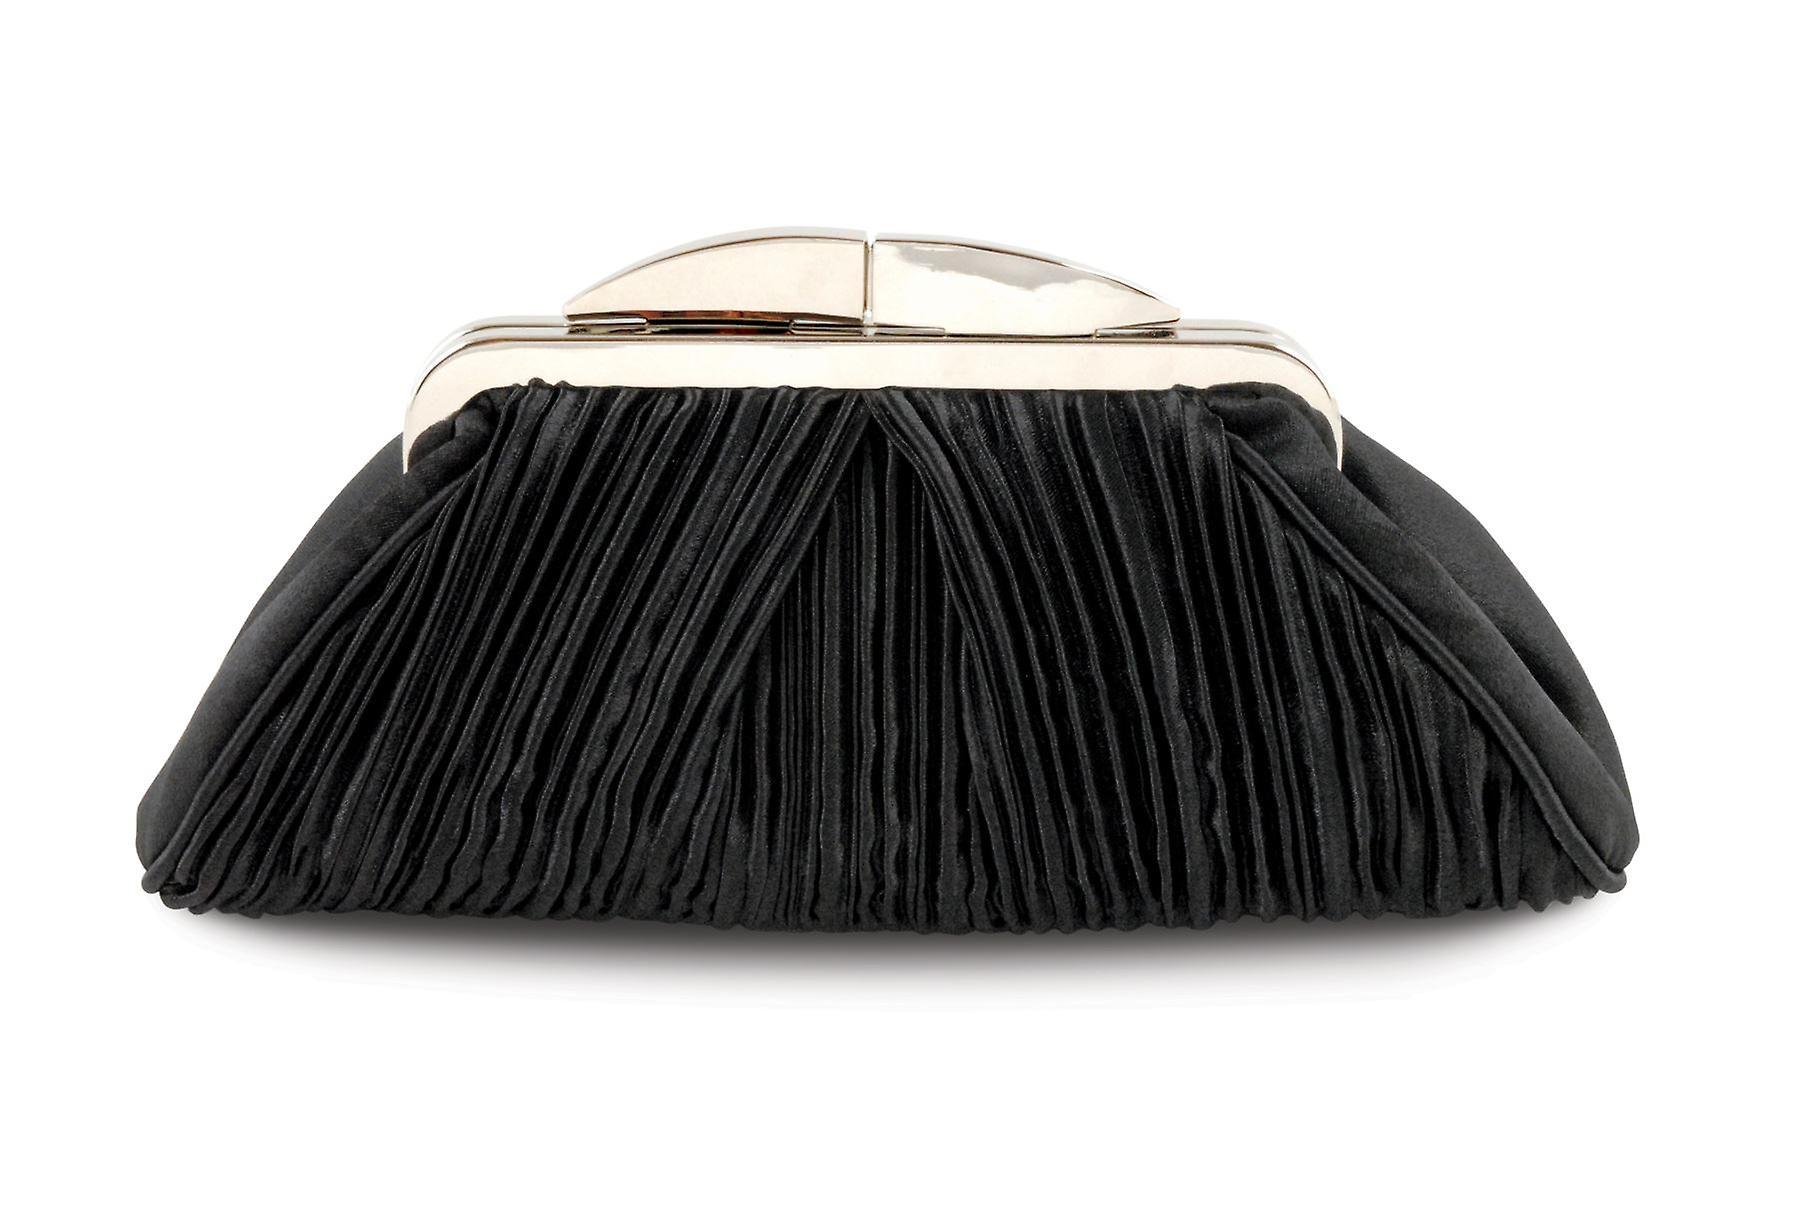 Ladies Ruffled Effect Diamante Clasp Accent Peep Toe Women's Clutch Purse Bag